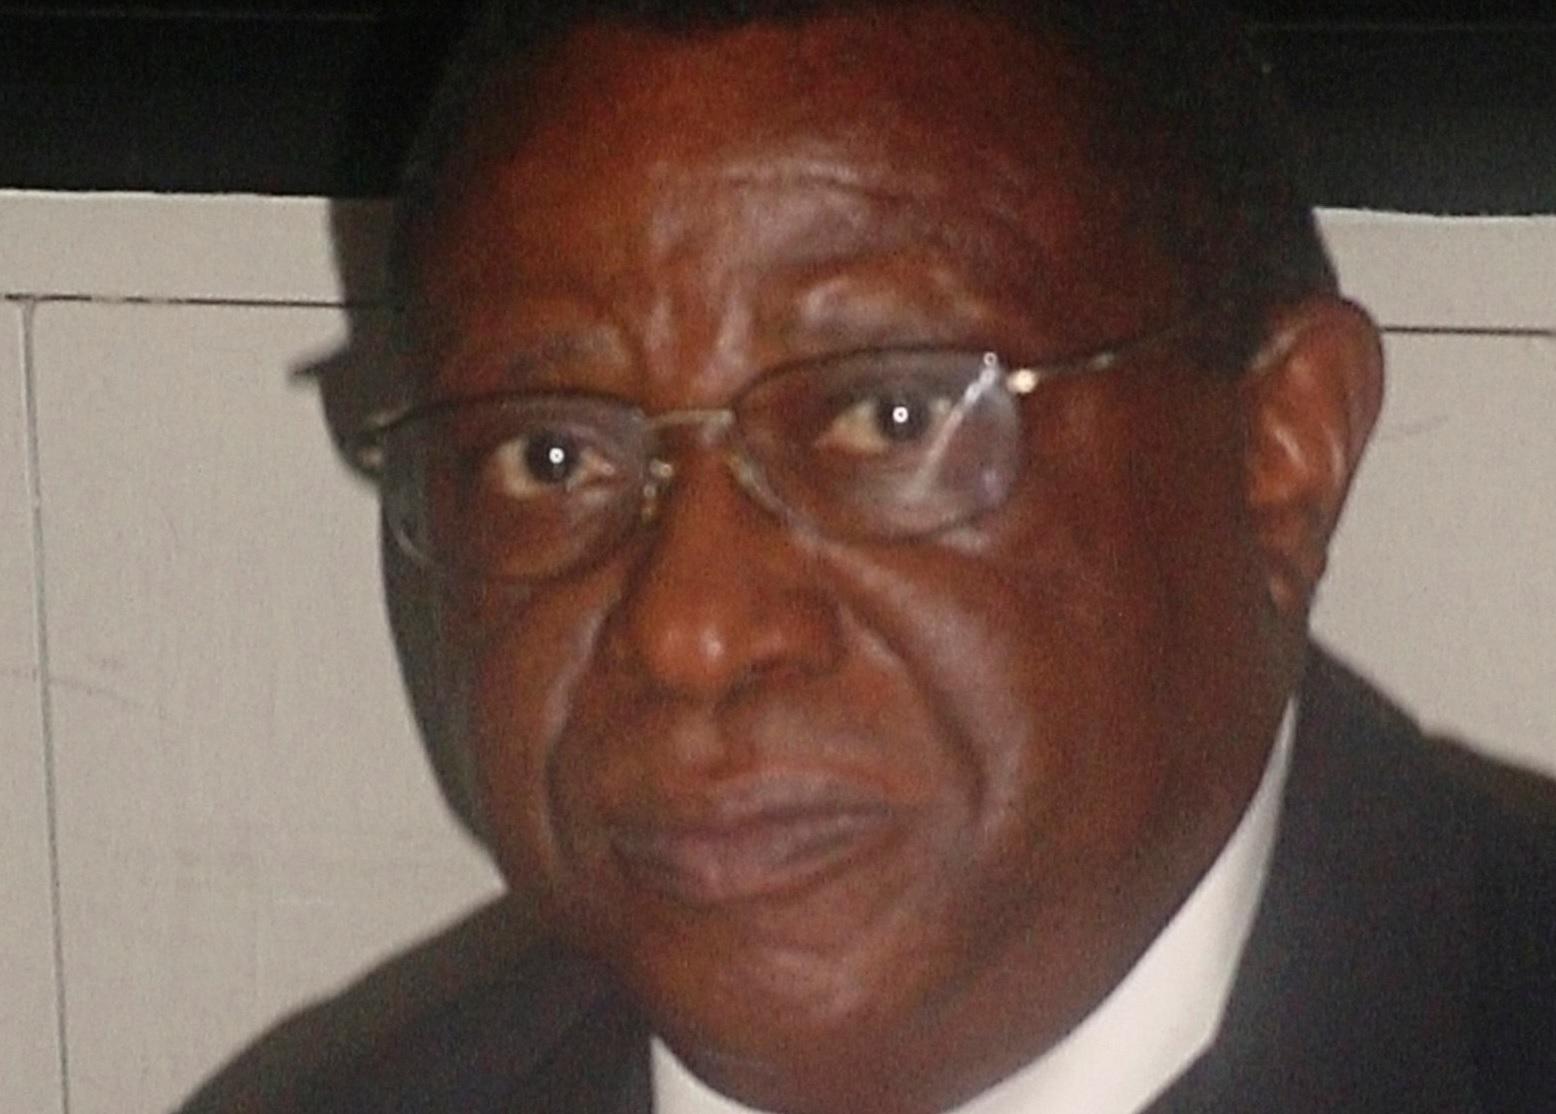 Rwandan genocide 'kingpin' Bagosora dies in Mali prison, sources say